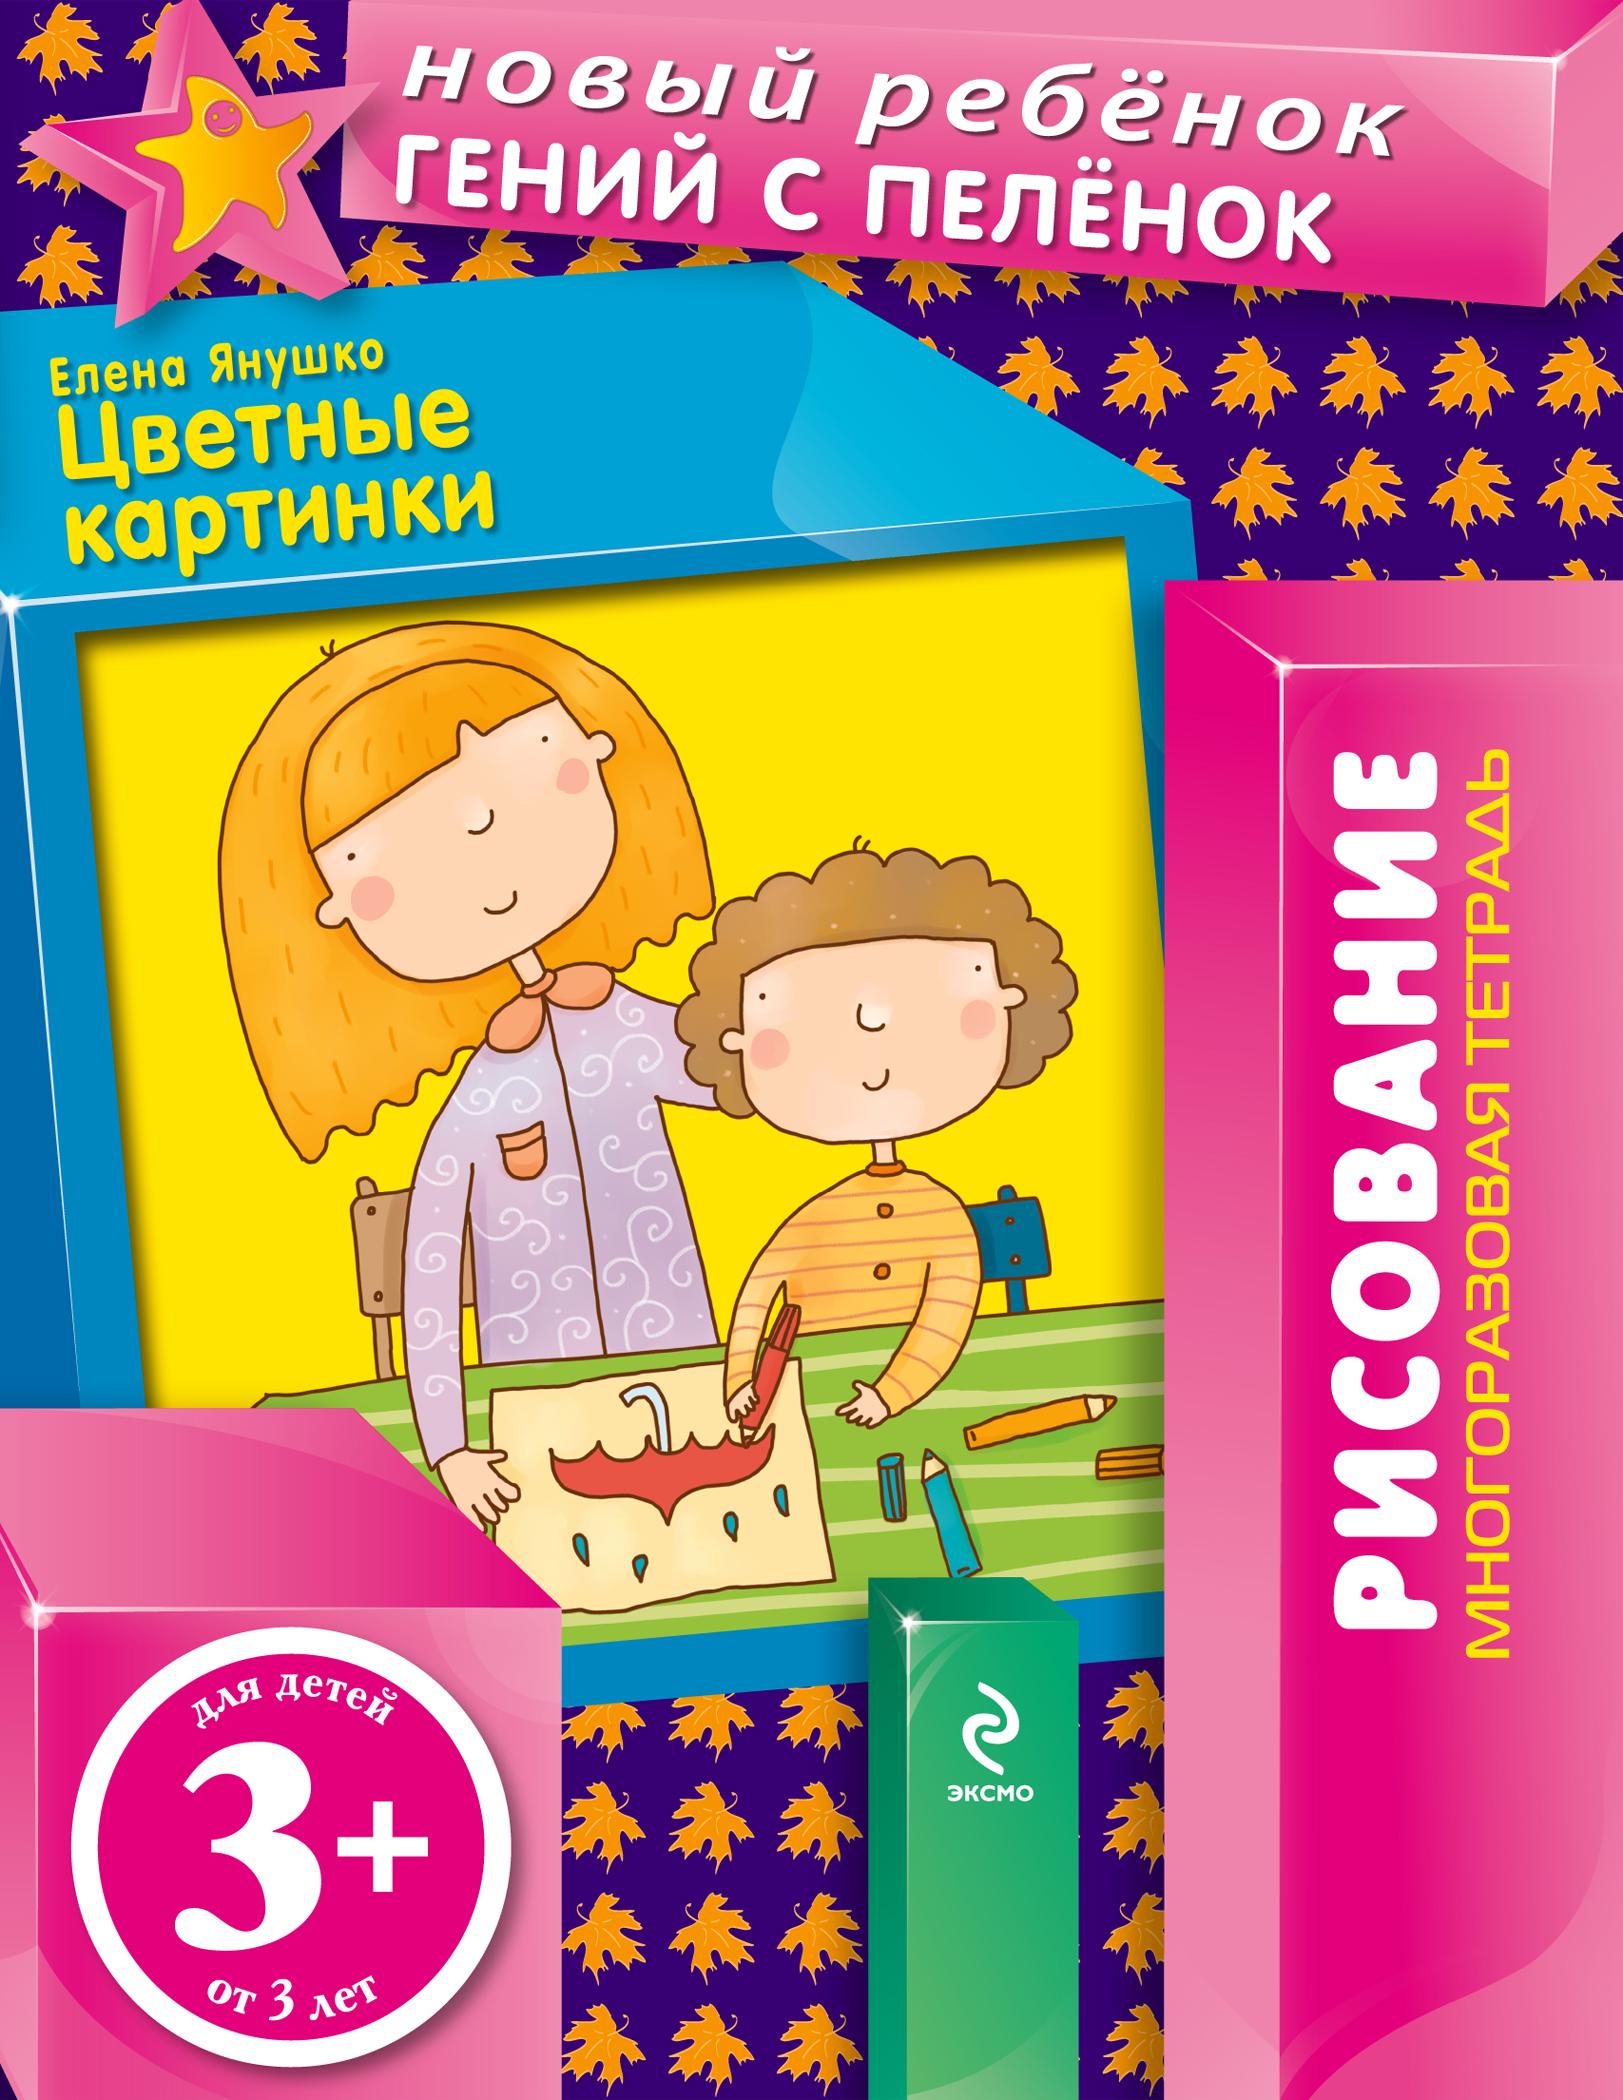 3+ Цветные картинки (многоразовая тетрадь) ( Янушко Е.А.  )